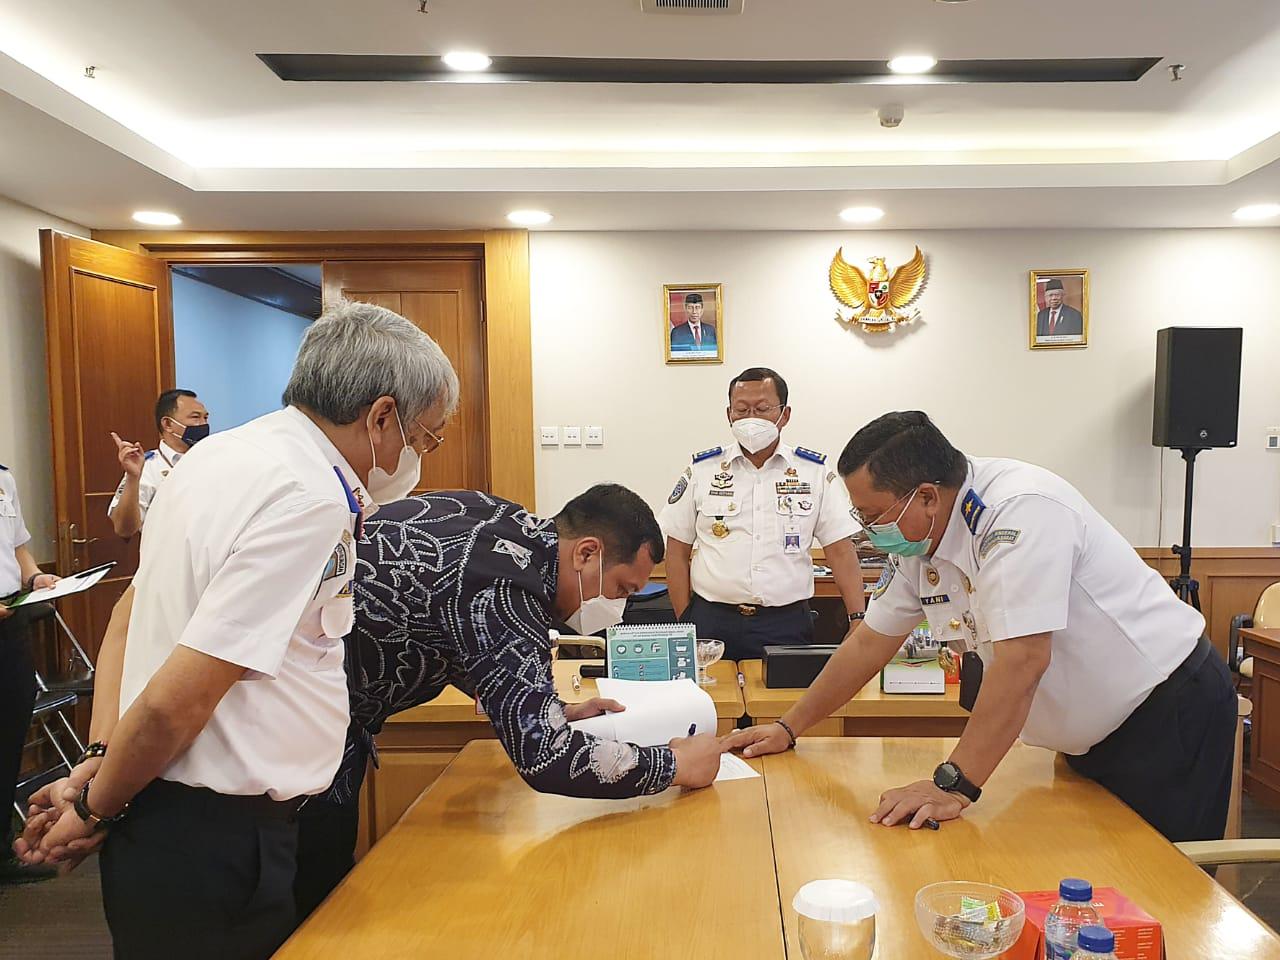 Wali Kota Banjarbaru bersama jajaran Kemenhub RI membahas rencana pembangunan Kota Banjarbaru